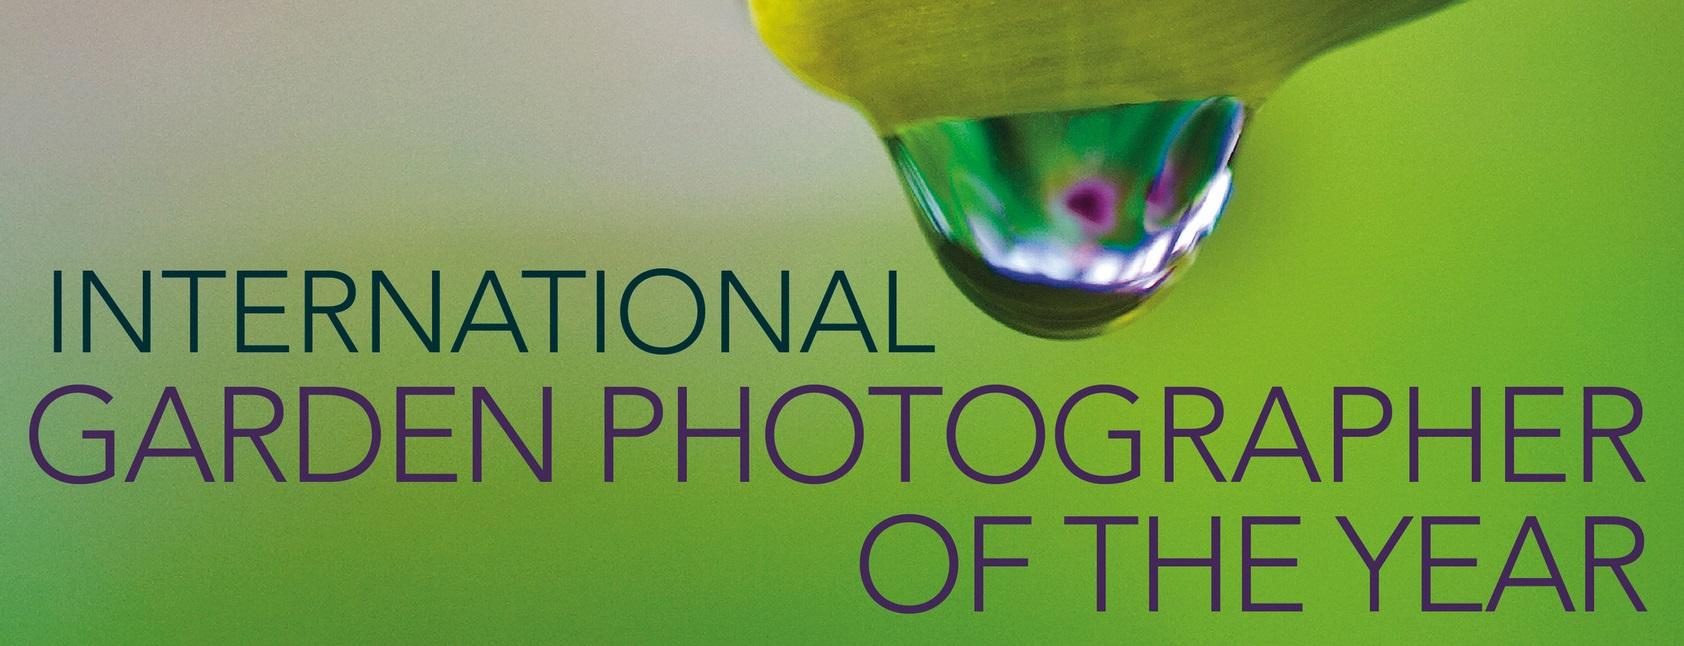 IGPOTY 13 – International Garden Photographer of the Year 2019 - logo